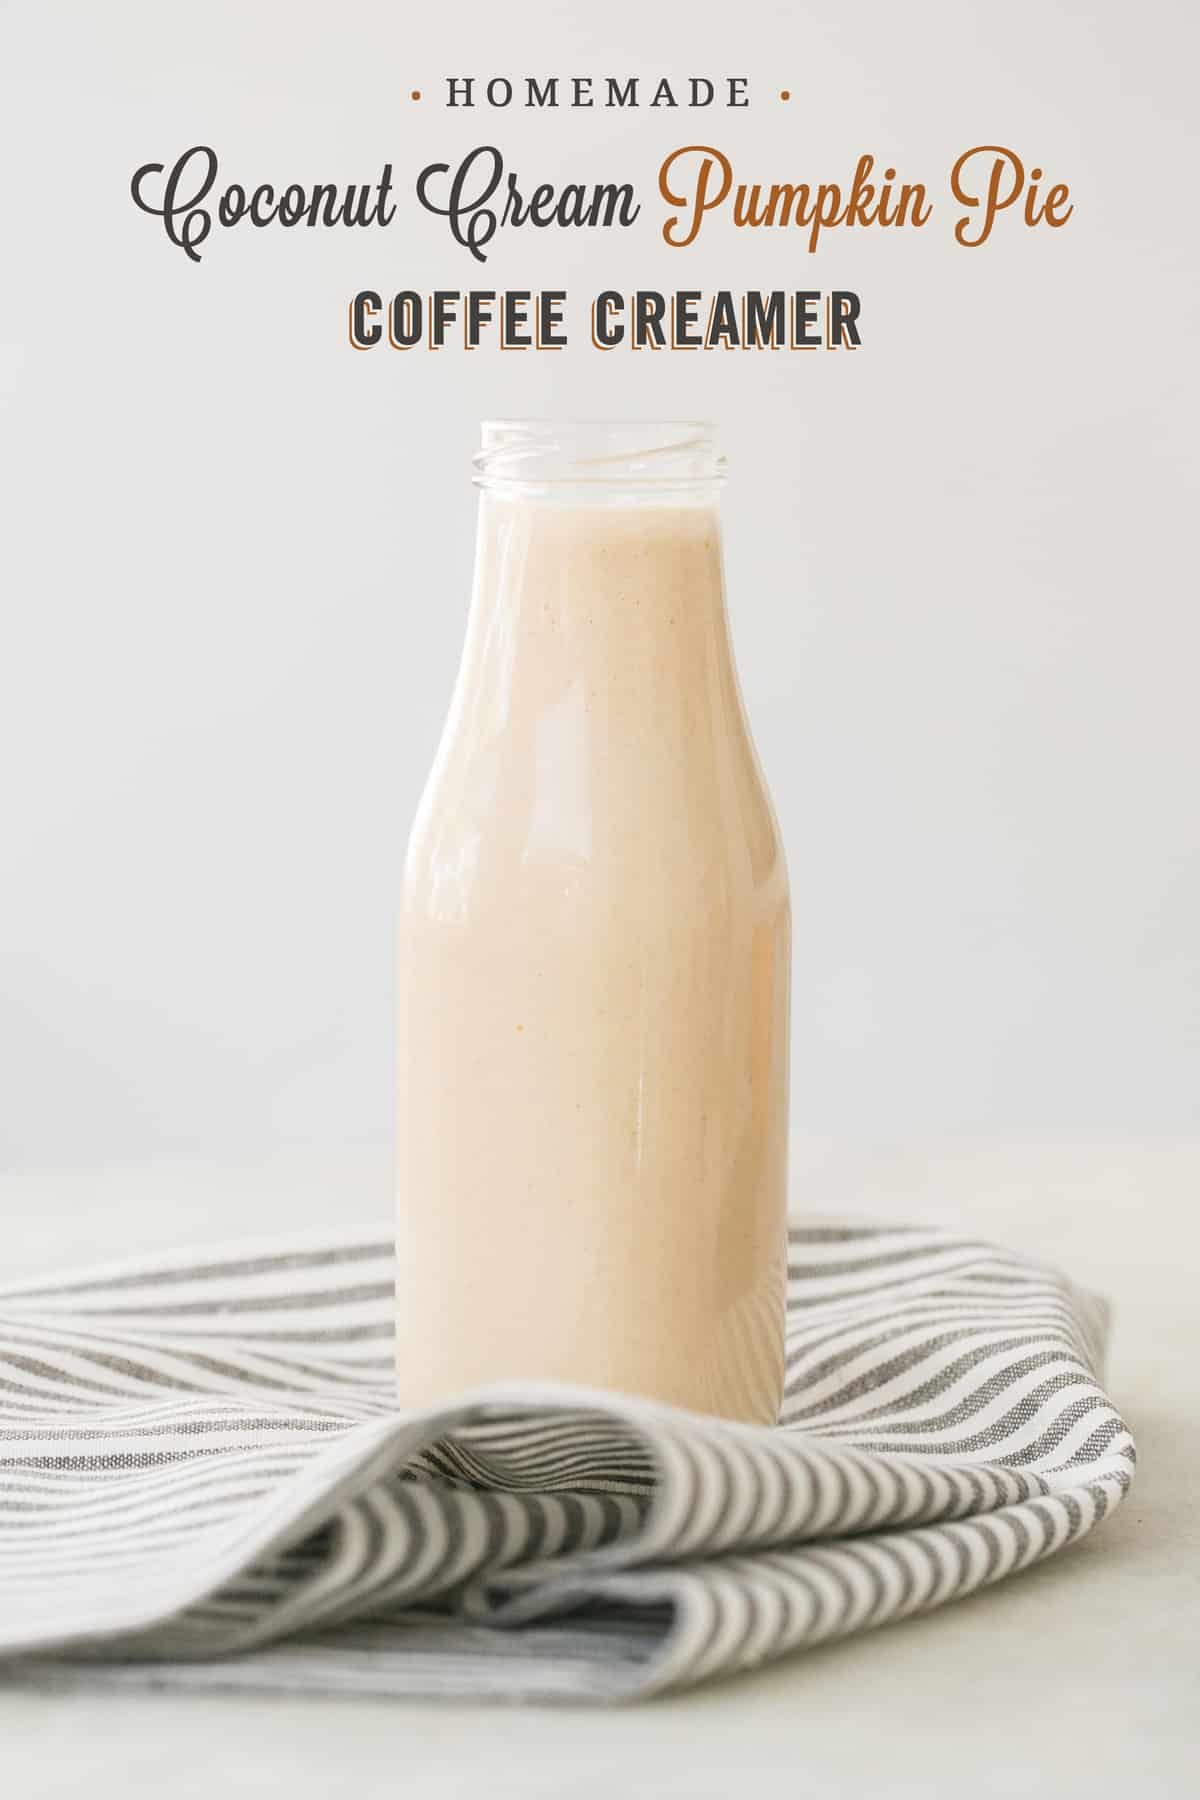 shot of coffee creamer in a glass bottle